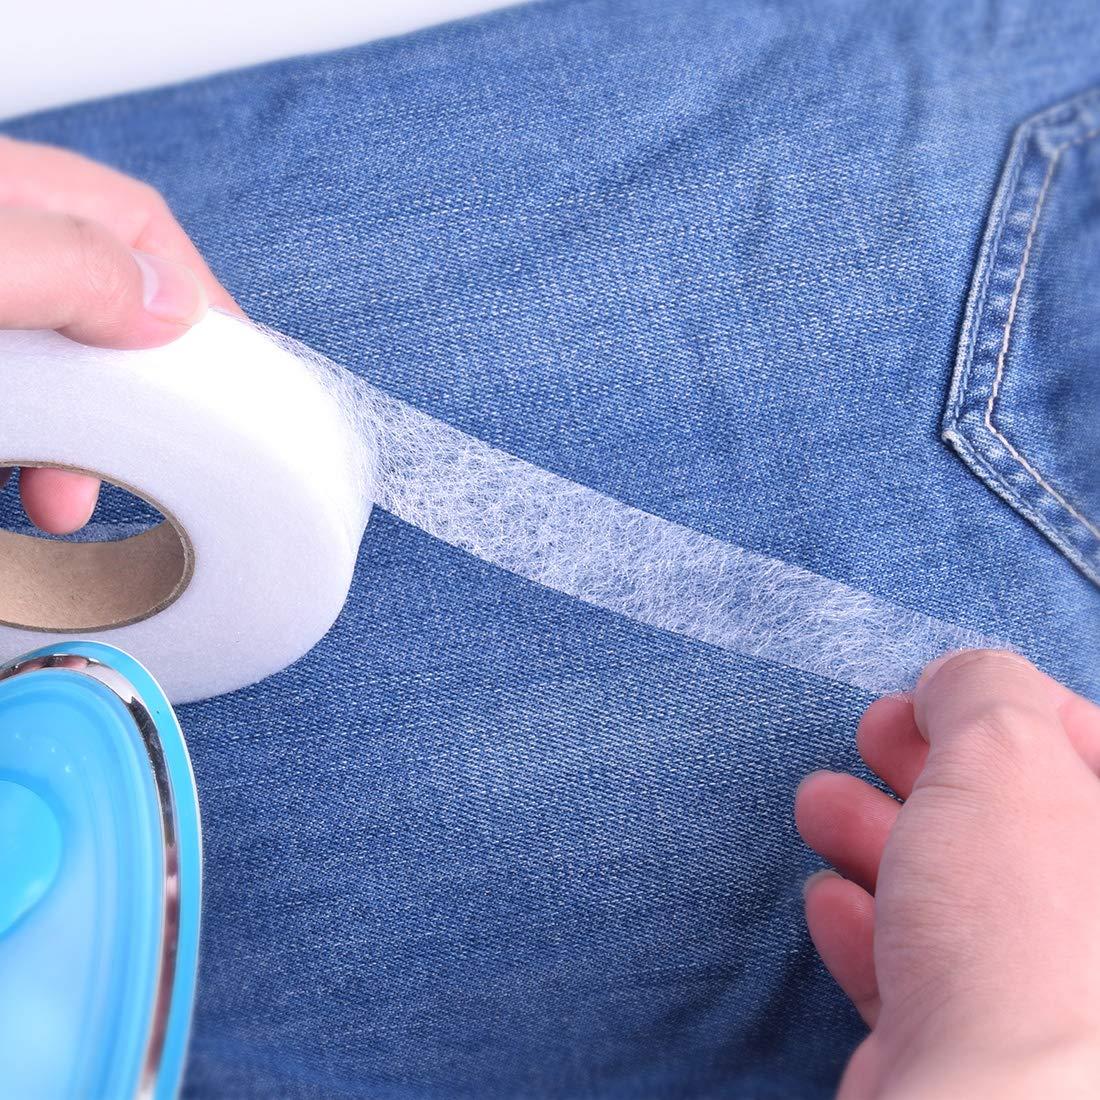 Hotusi 2 Pack 70 Yards Fabric Fusing Tape Adhesive Hem Tape Iron-on Adhesive Tape Hemming Tape